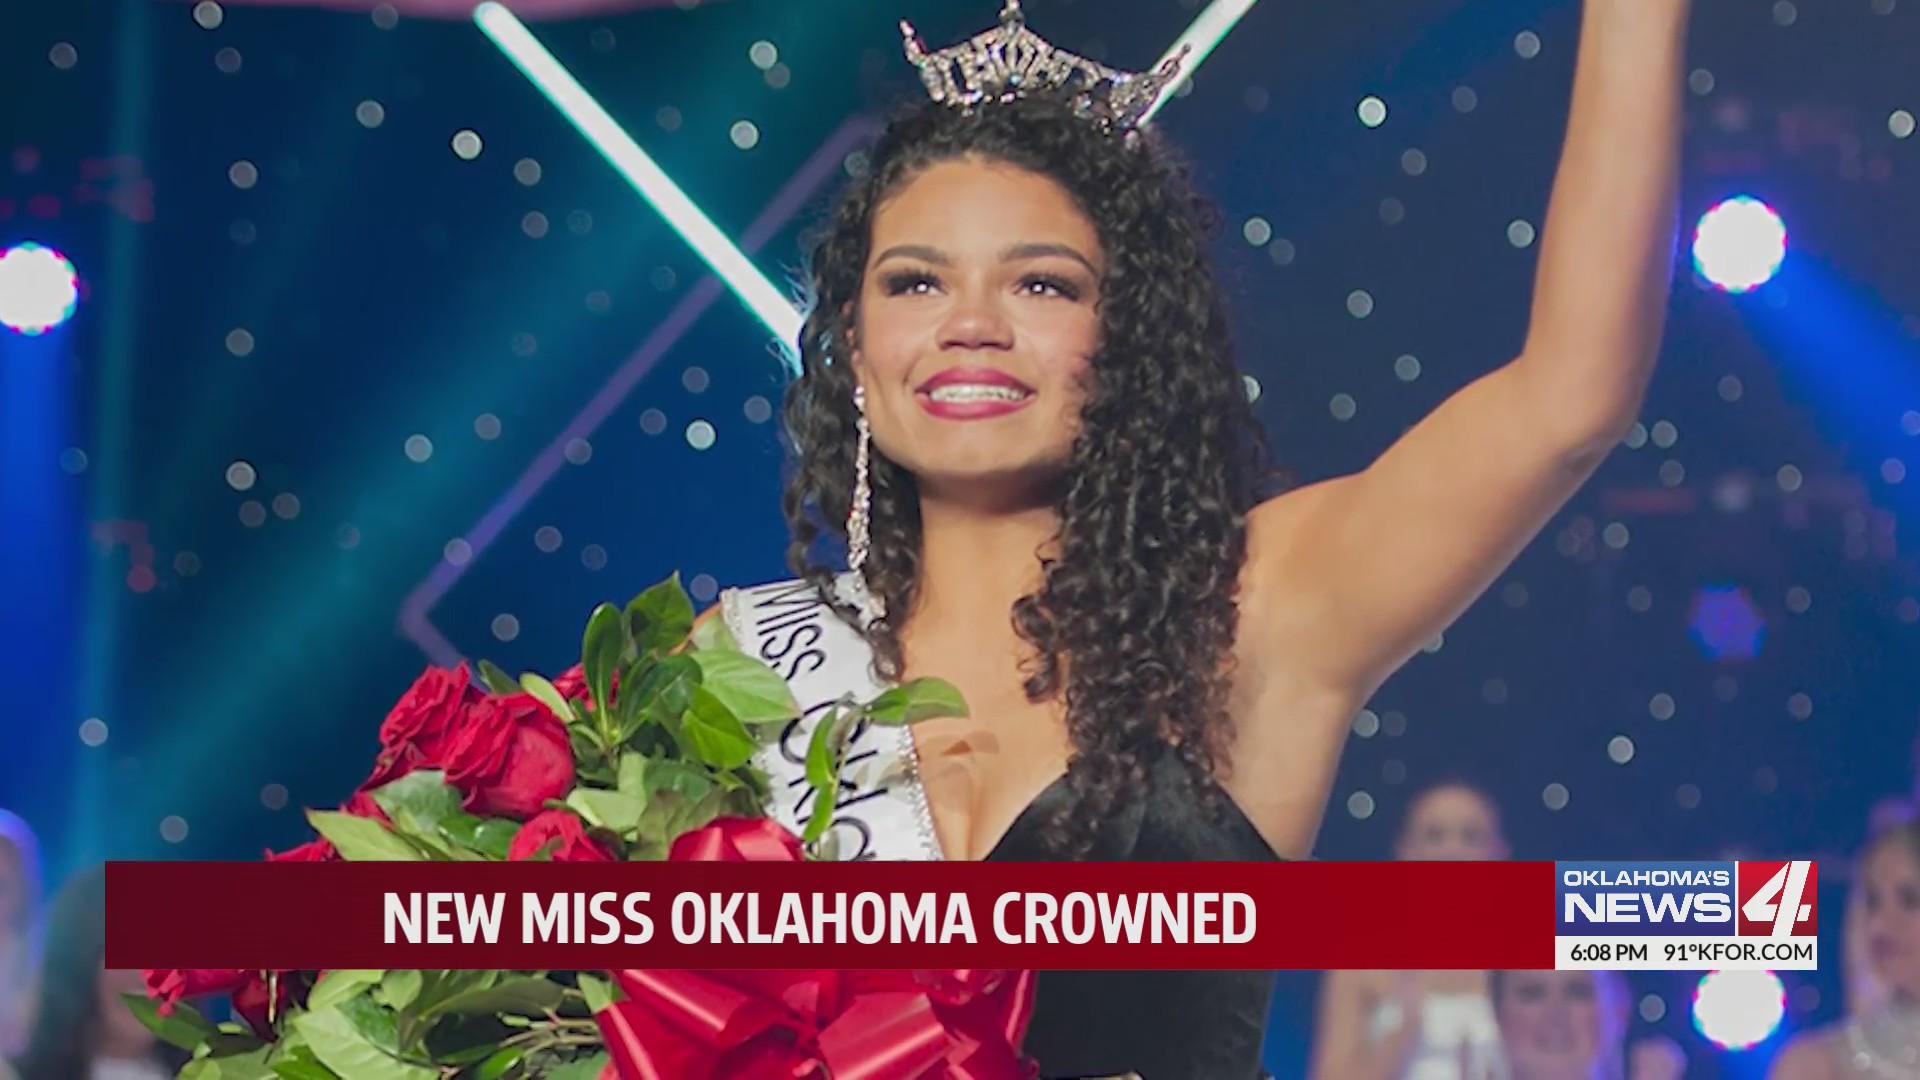 Miss Oklahoma 2021, Ashleigh Robison